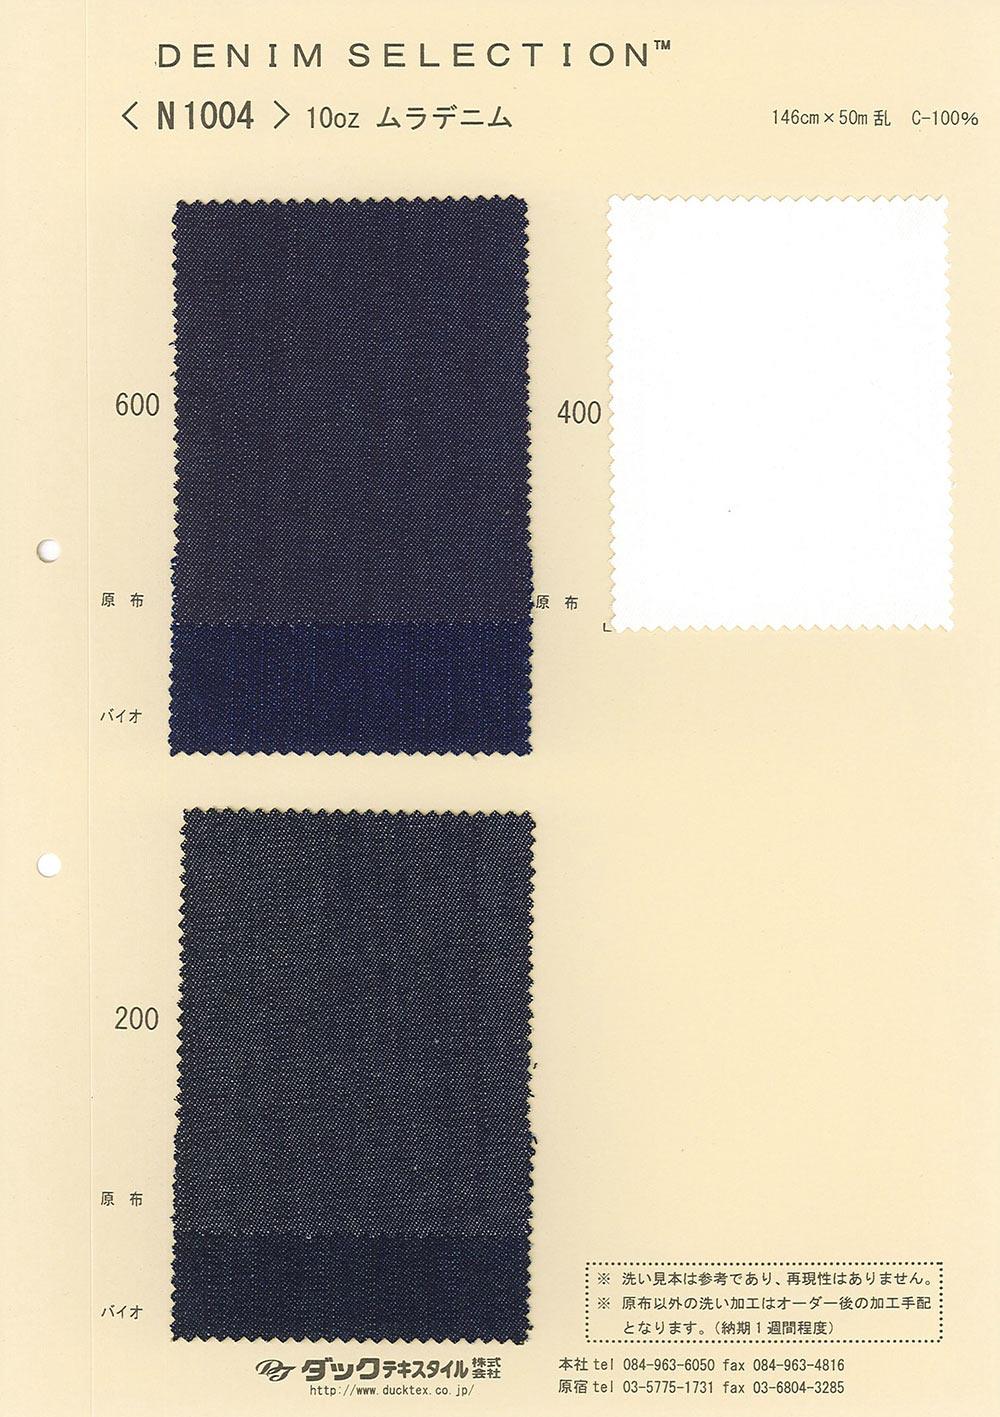 N1004 10オンスムラデニム[生地] ダックテキスタイル/オークラ商事 - ApparelX アパレル資材卸通販